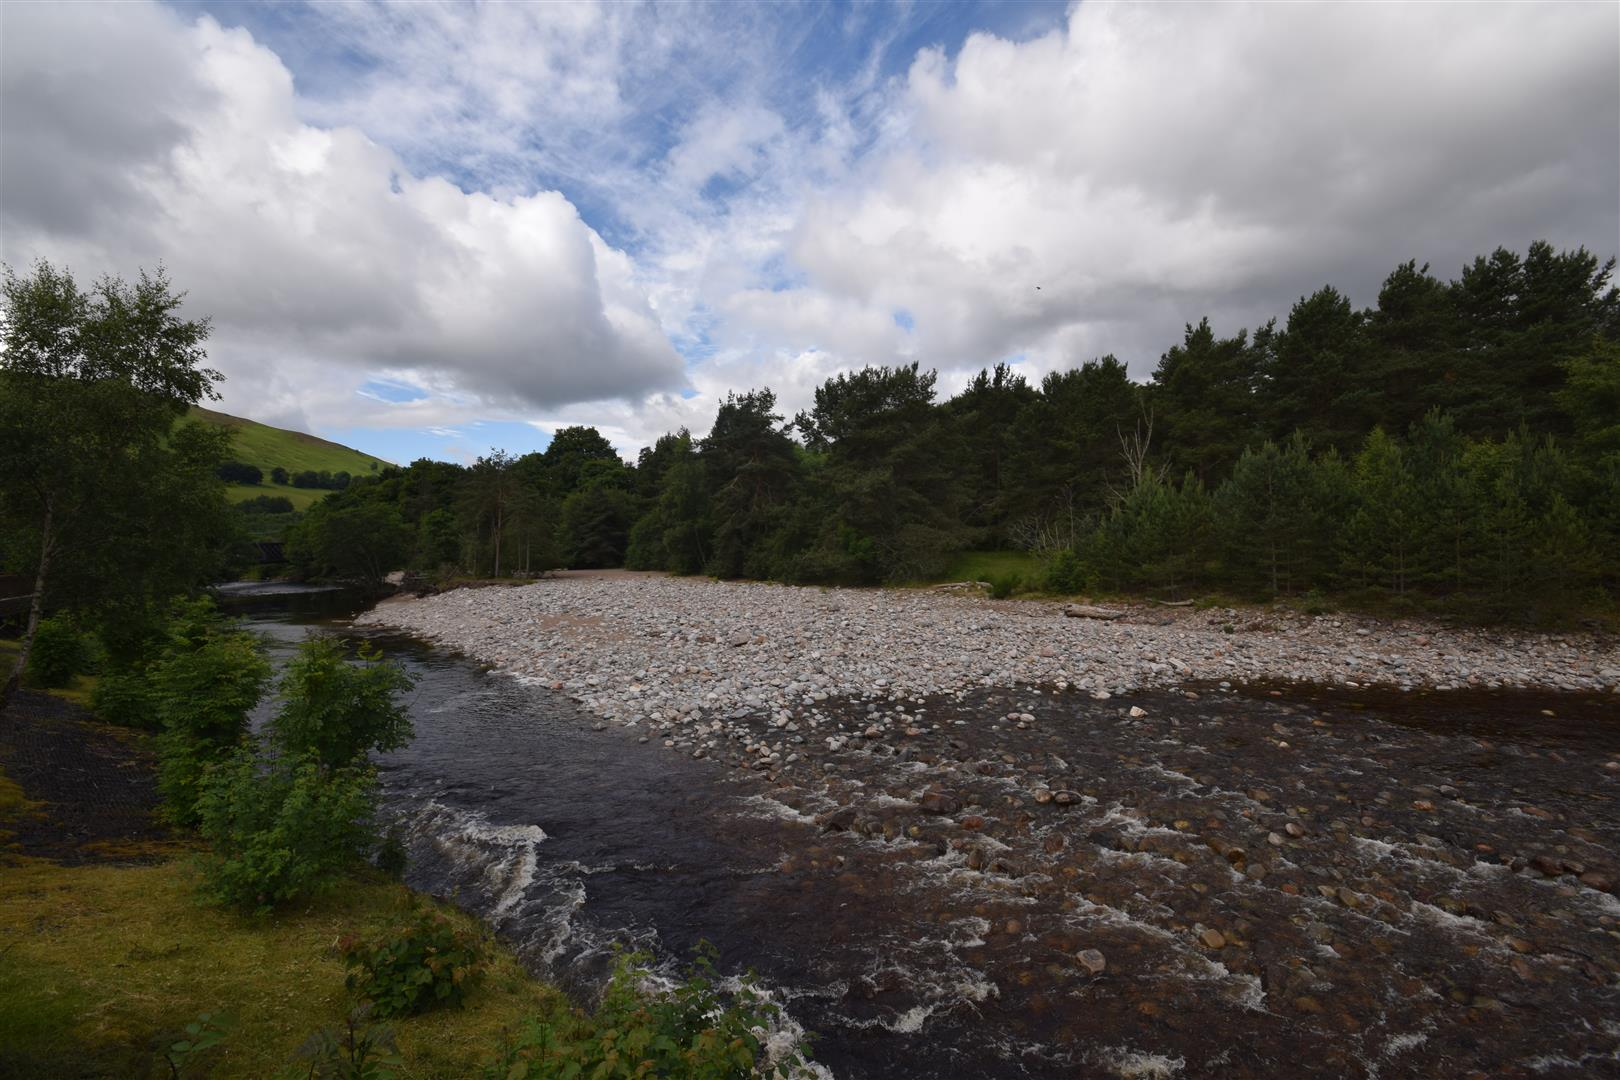 Invertilt Road, Blair Atholl, Blair Atholl, Perthshire, PH18 5TE, UK